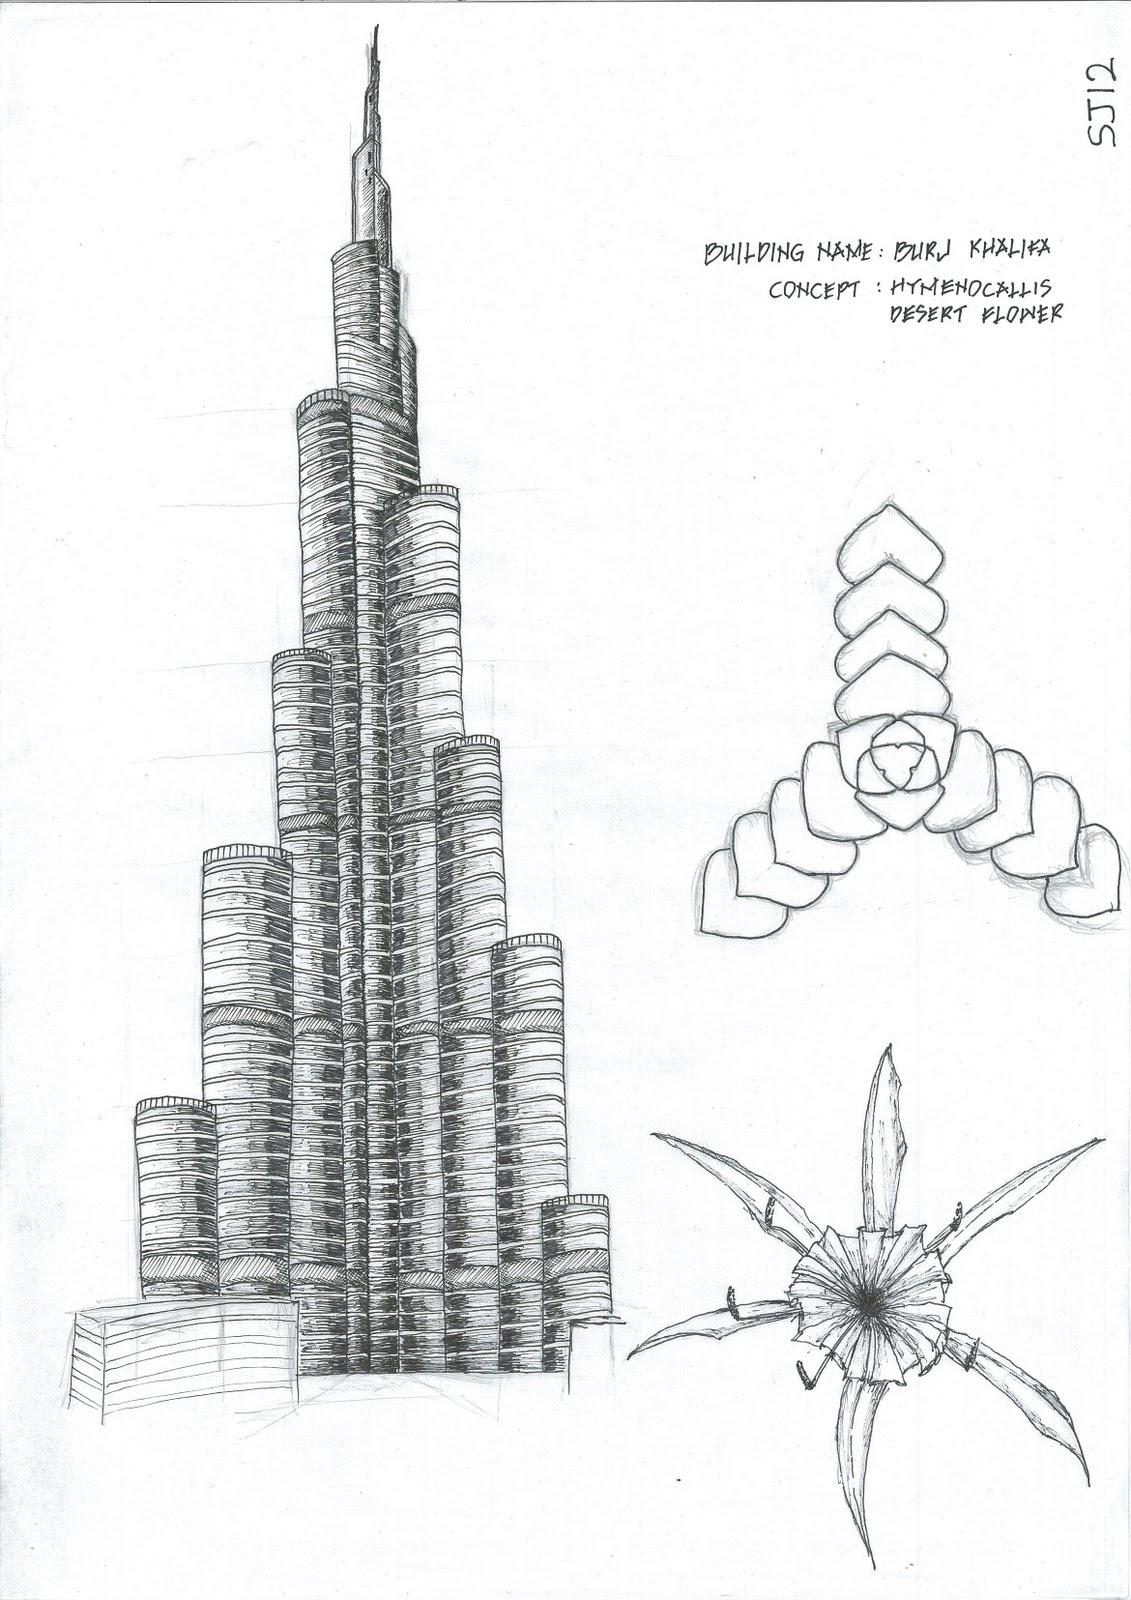 Construartech